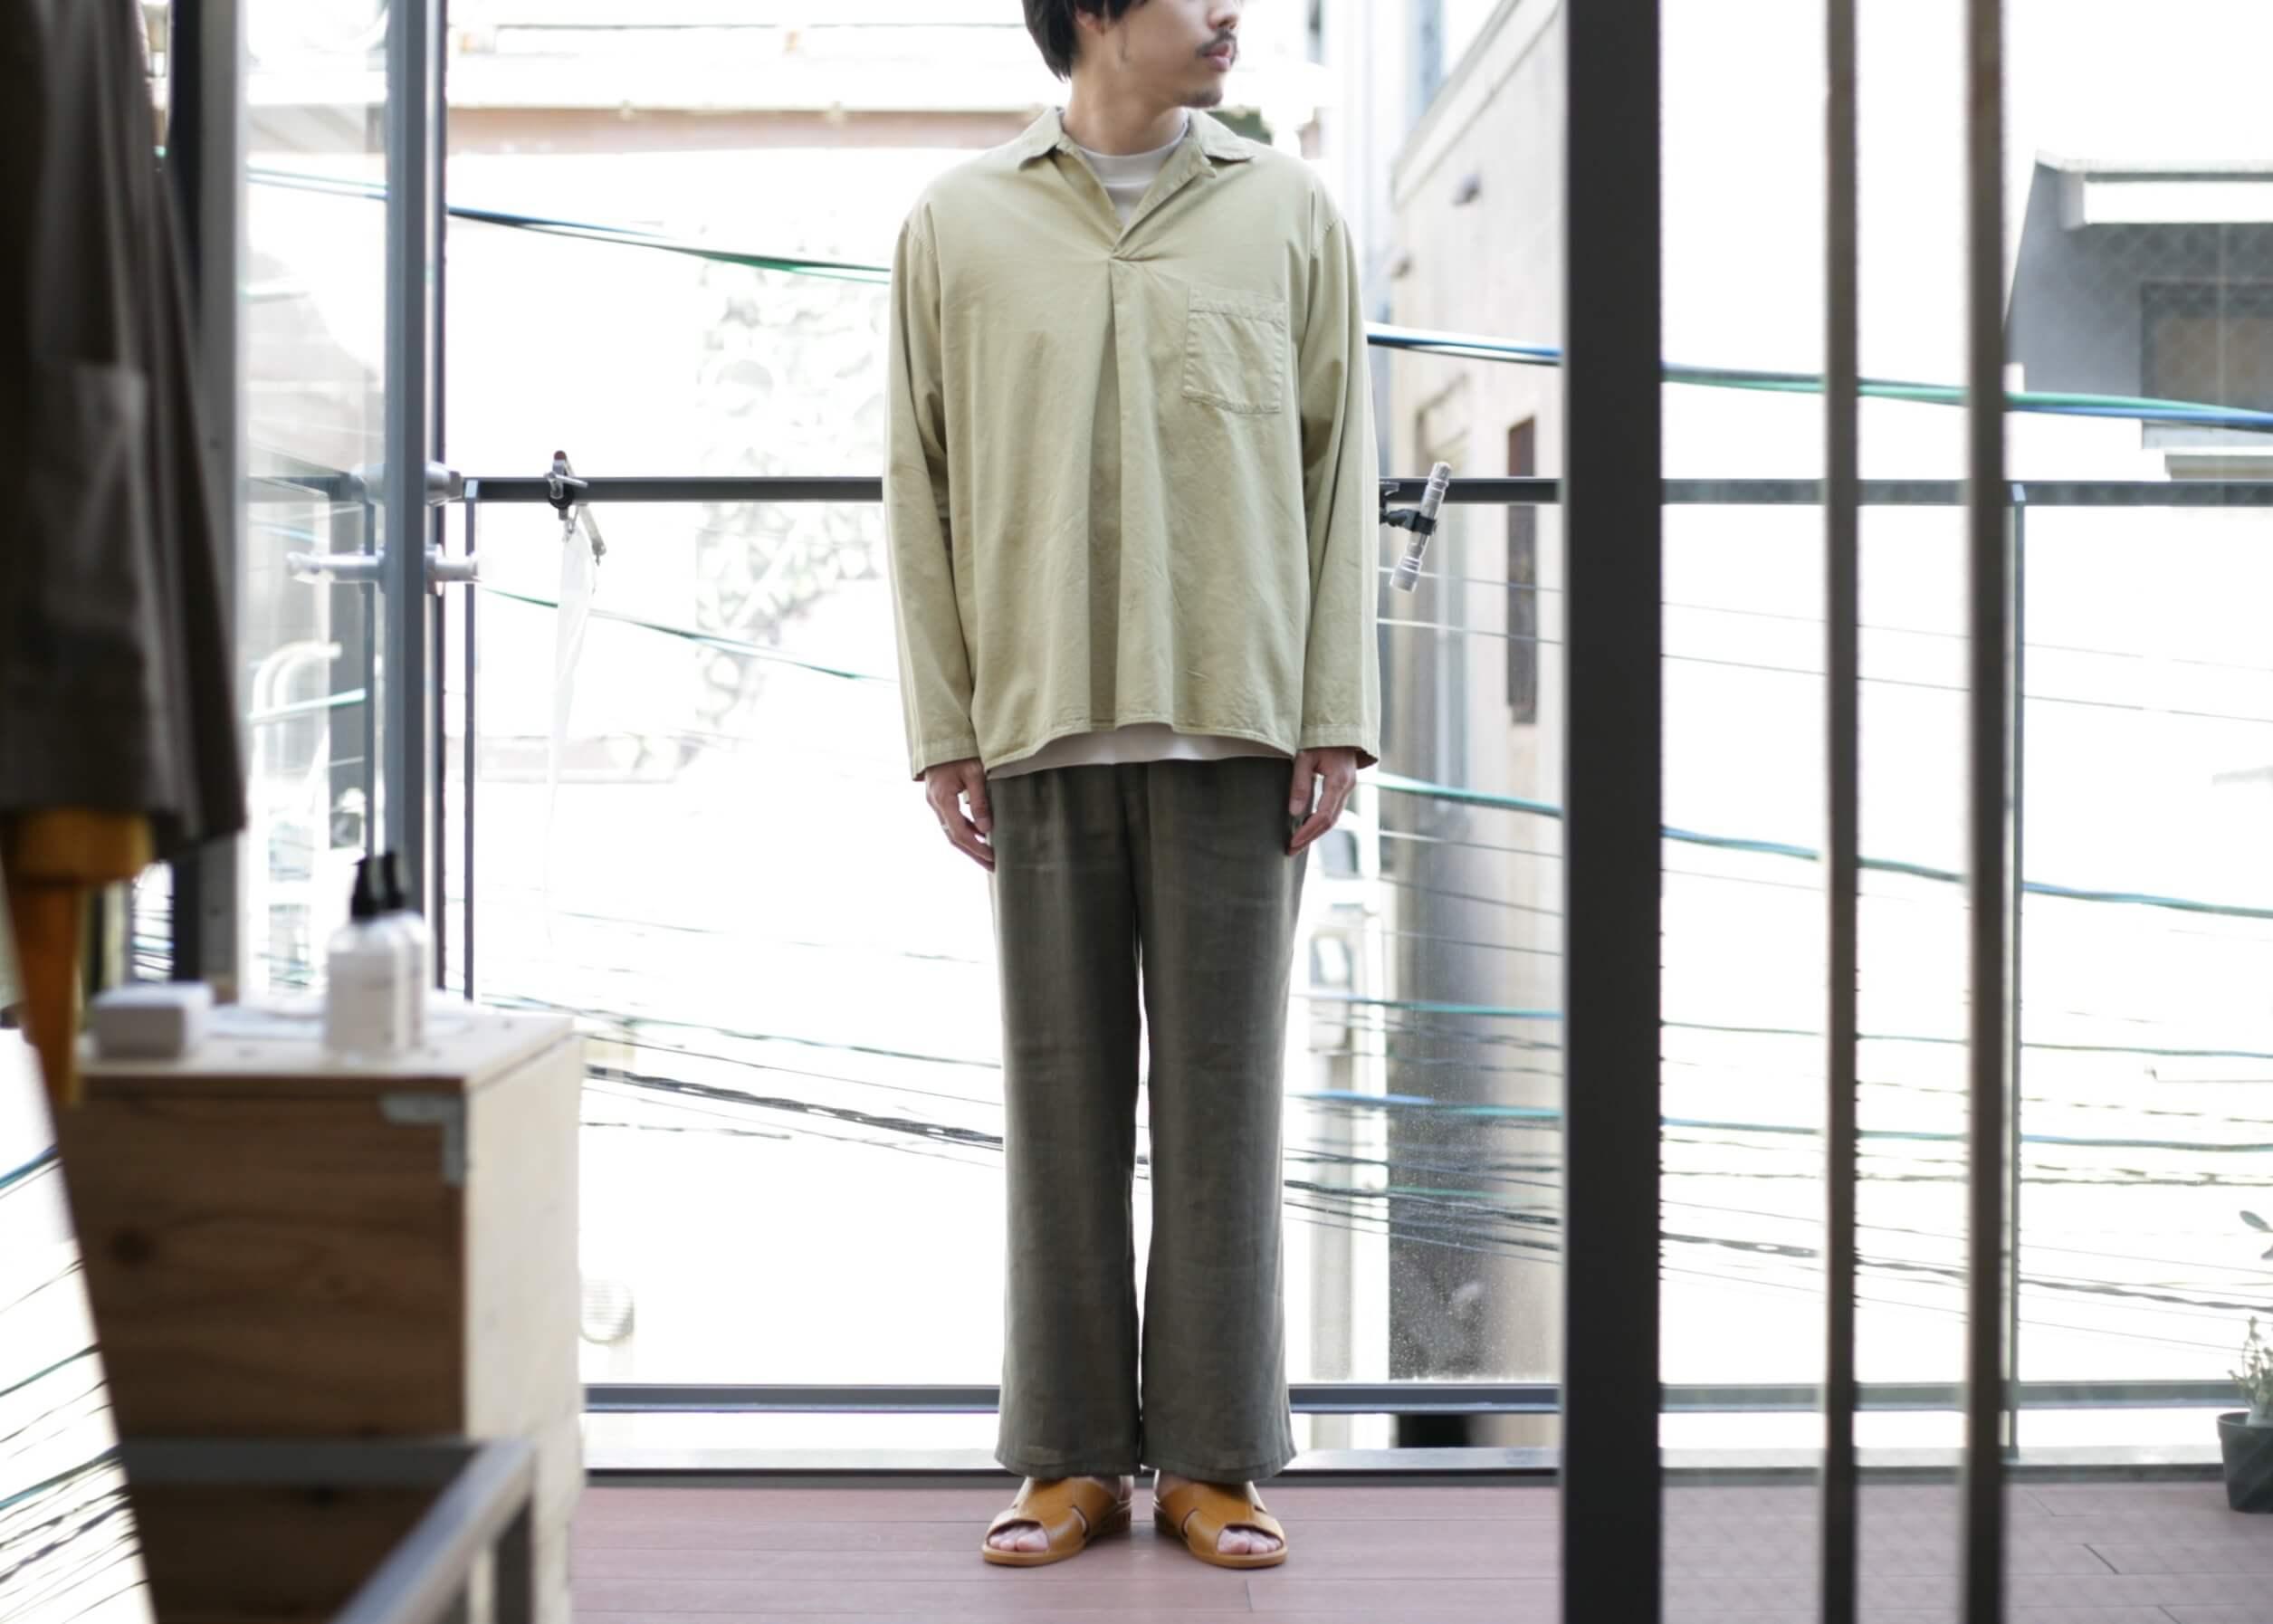 bunt - skipper shirts beige 着用写真